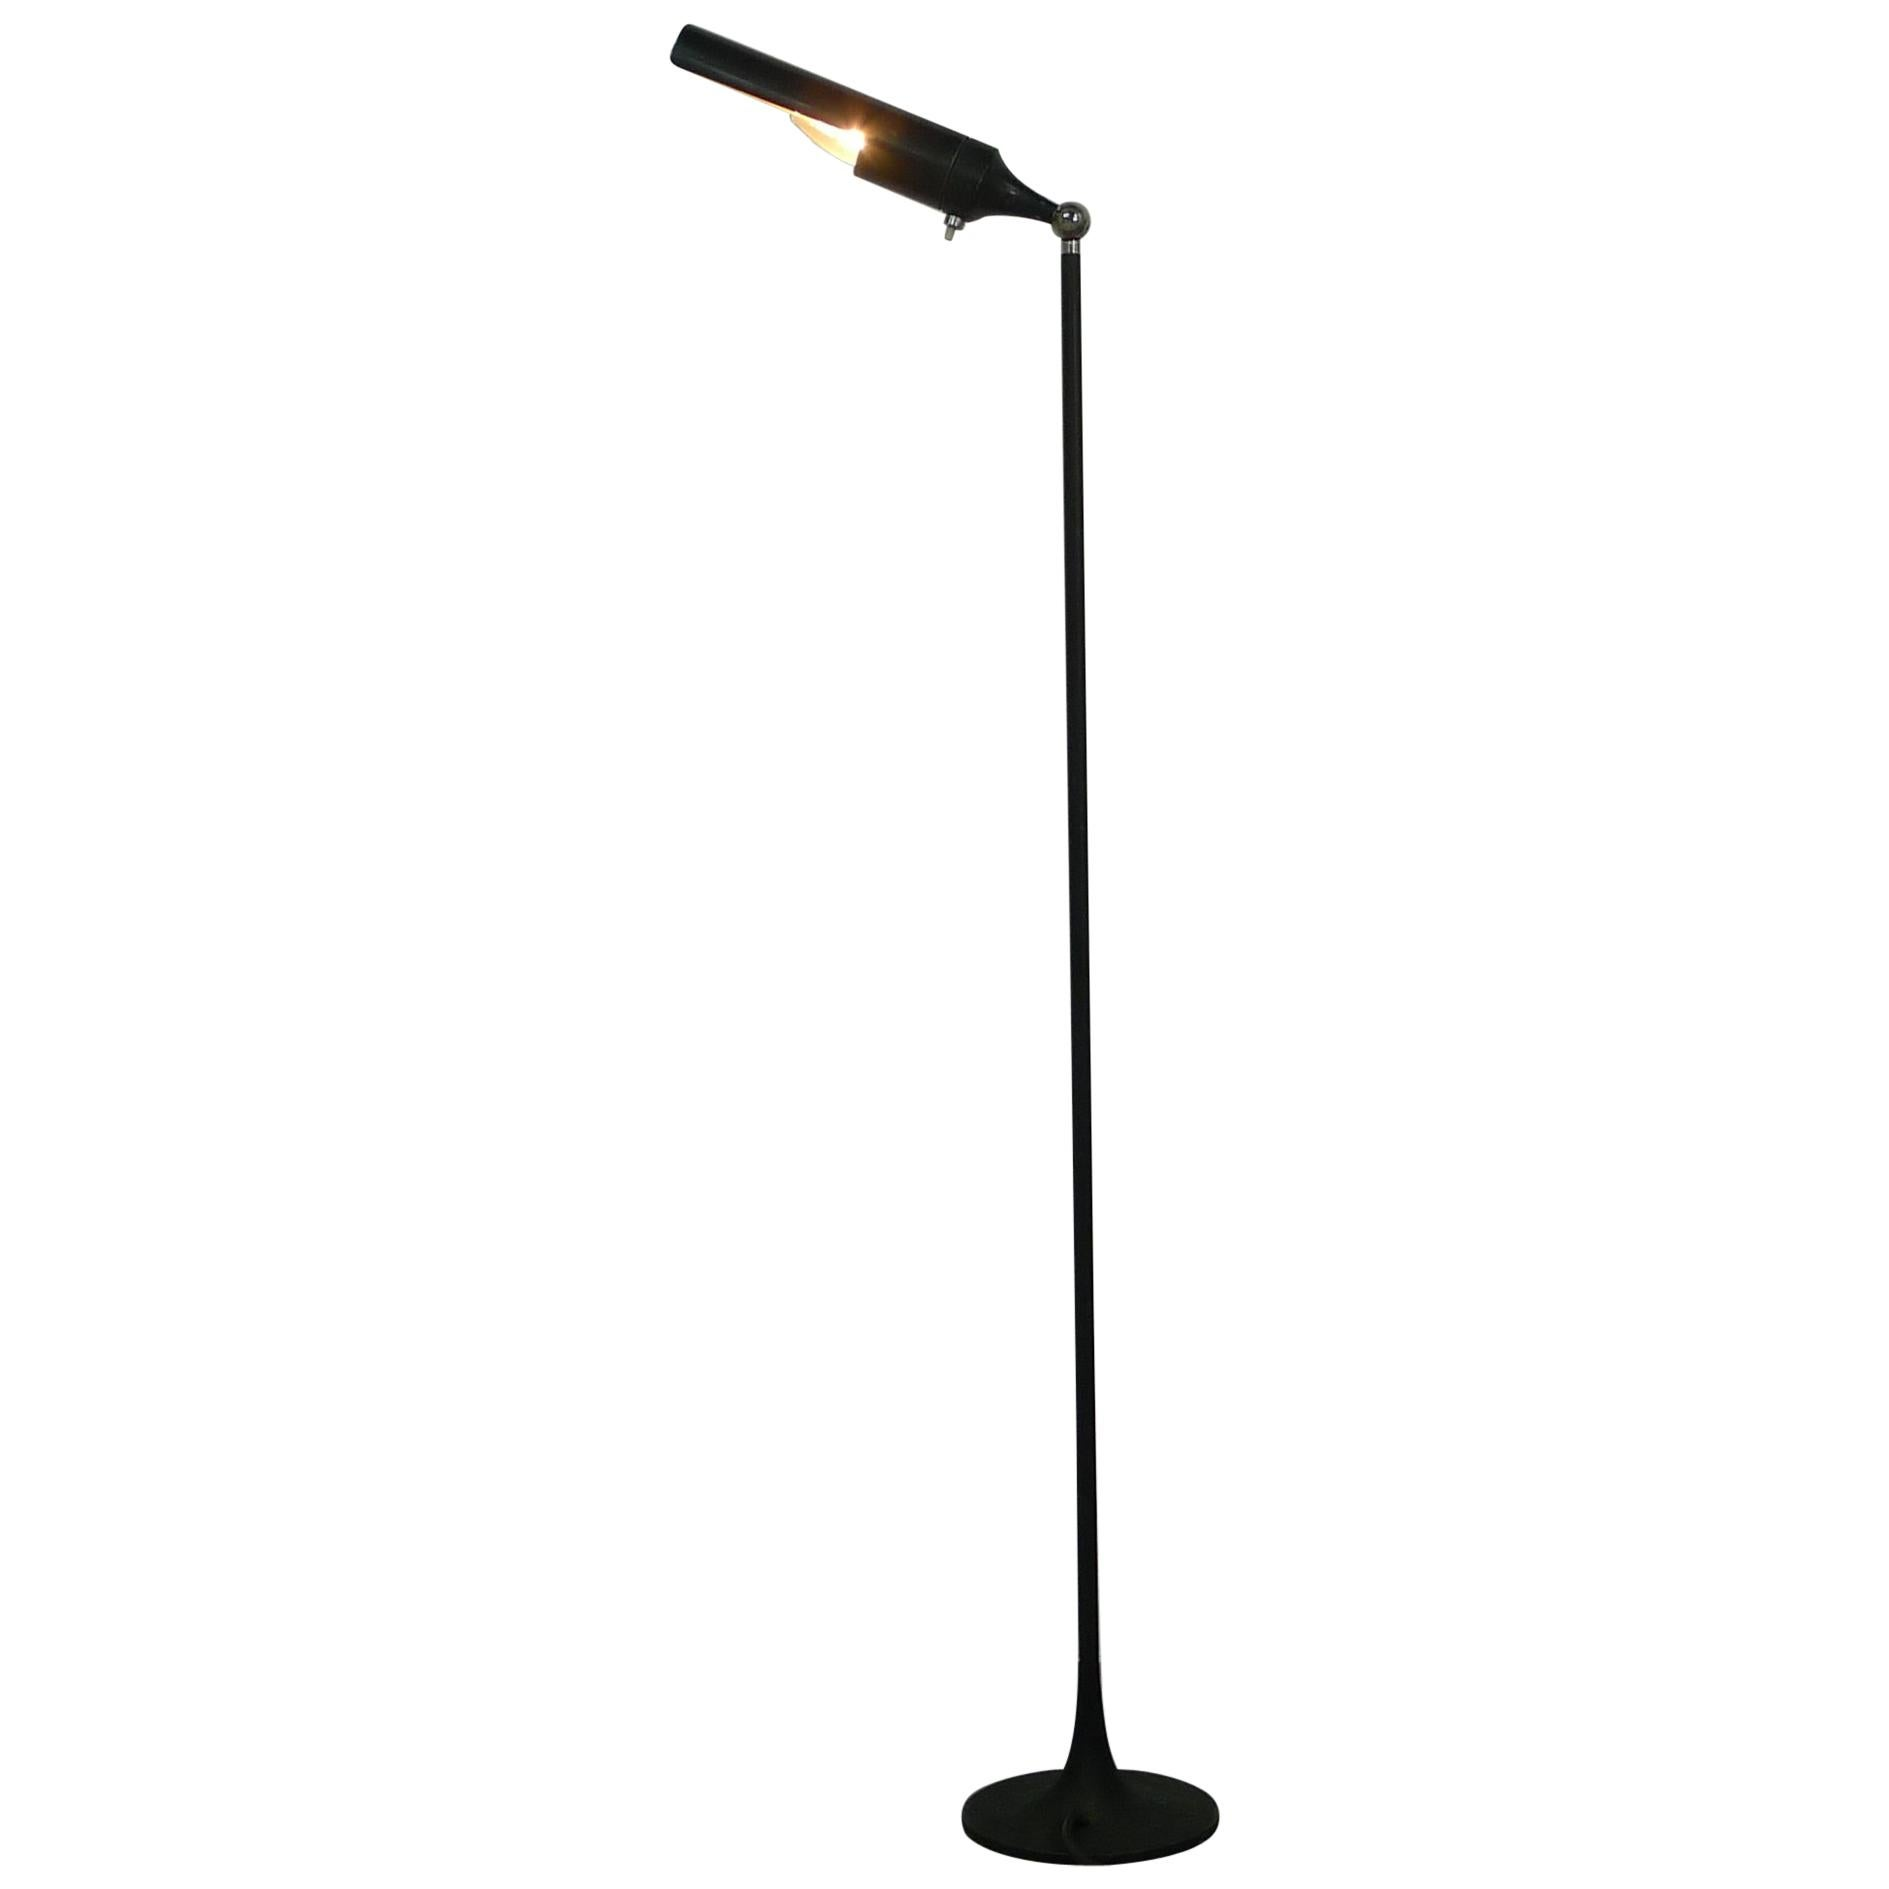 Gino Sarfatti for Artreluce, Italy, Floor Lamp Model 1086, 1961